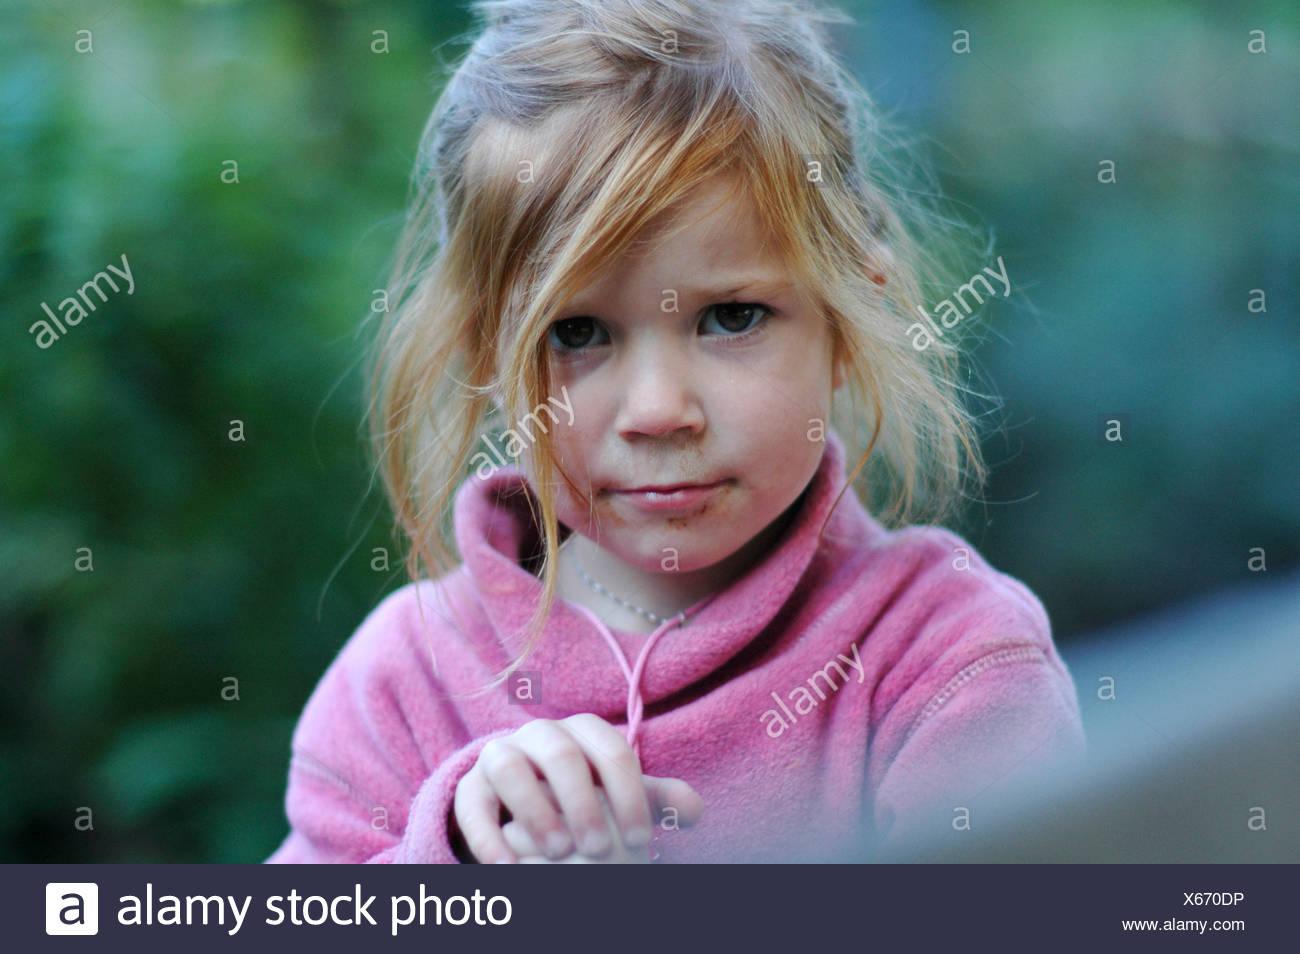 Wild girl with tousled disheveled hair - Stock Image